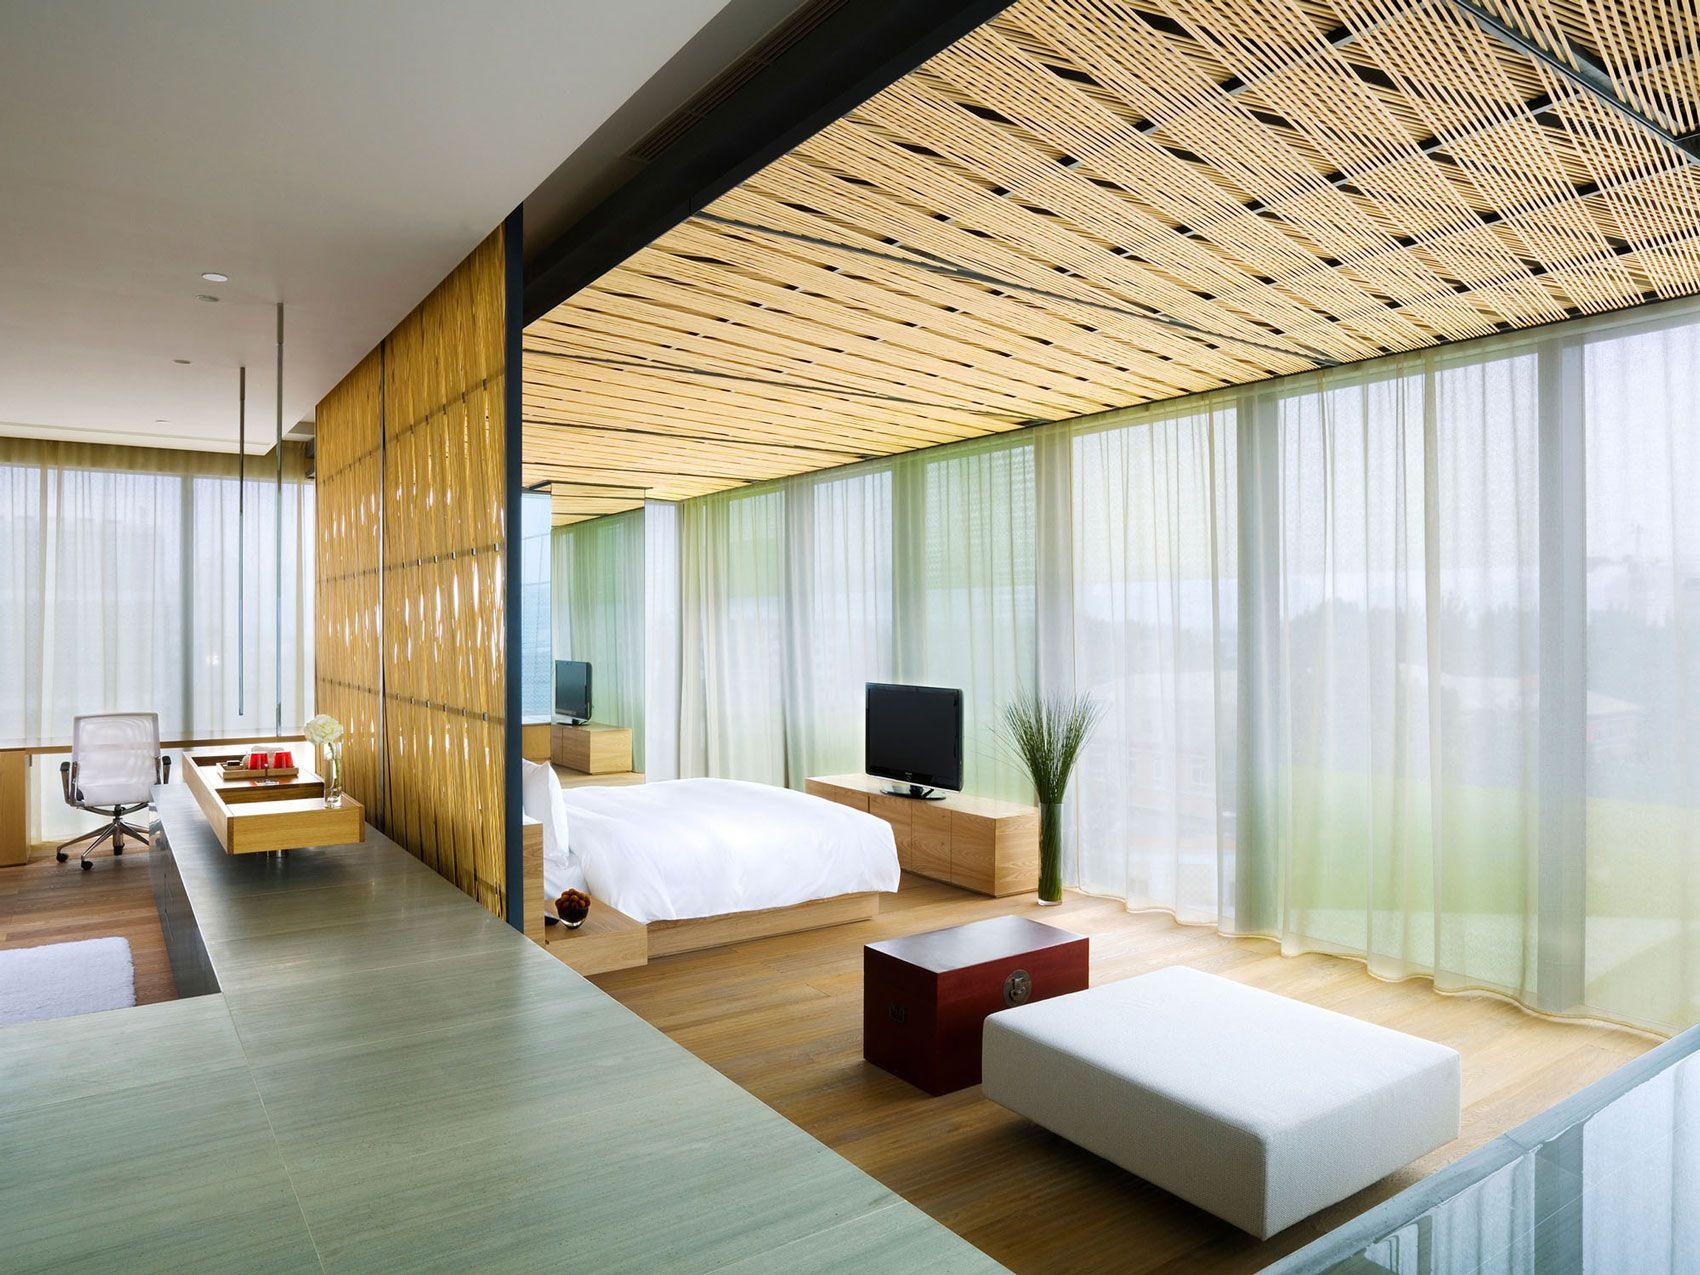 furniture bamboo wall panel, affordable bamboo wall panels and